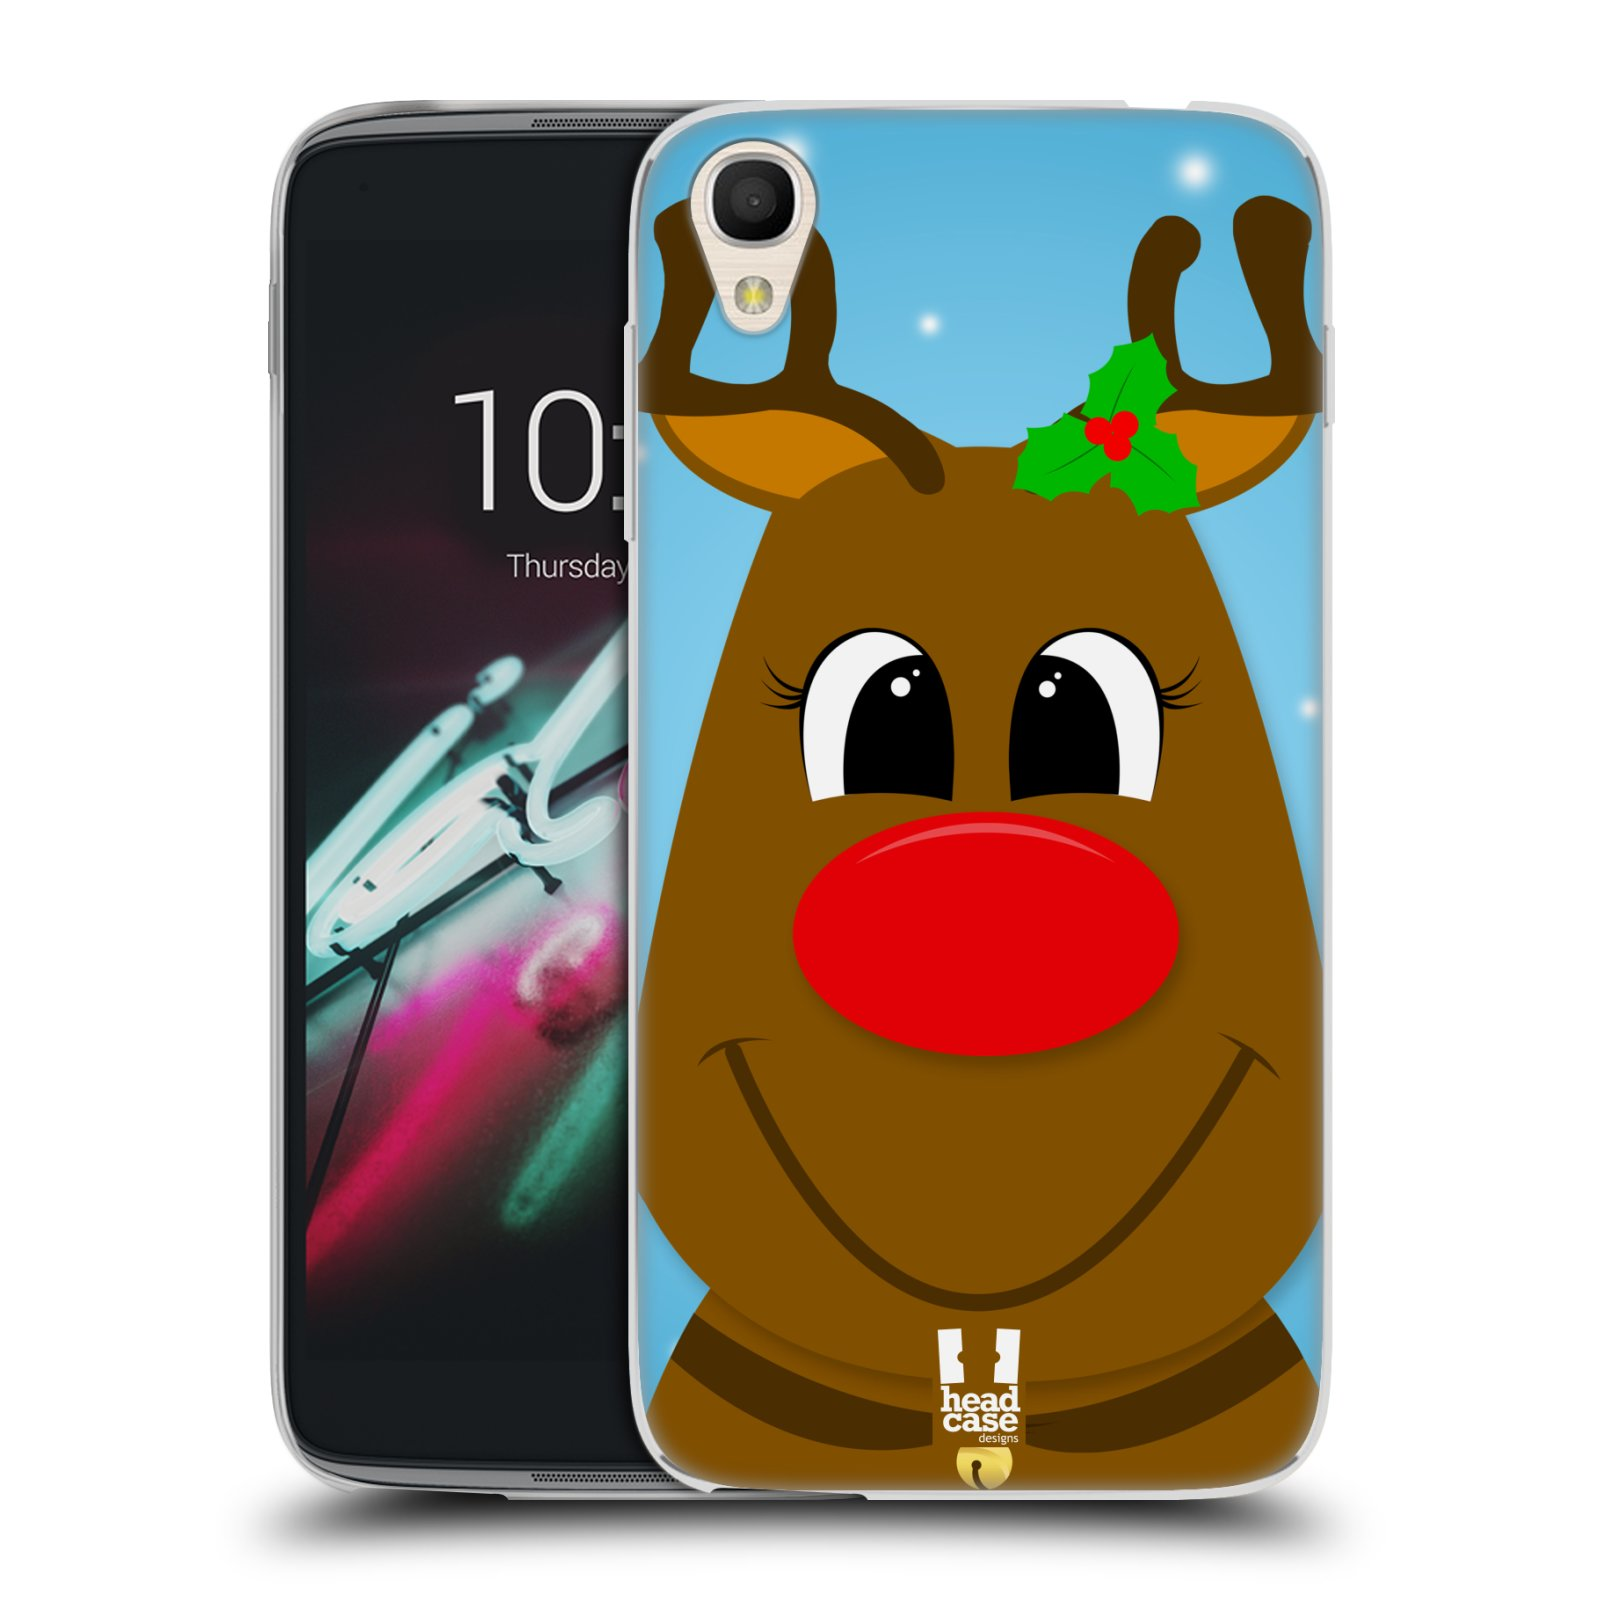 "Silikonové pouzdro na mobil Alcatel One Touch 6039Y Idol 3 HEAD CASE VÁNOCE RUDOLF SOB (Silikonový kryt či obal na mobilní telefon Alcatel One Touch Idol 3 OT-6039Y s 4,7"" displejem)"